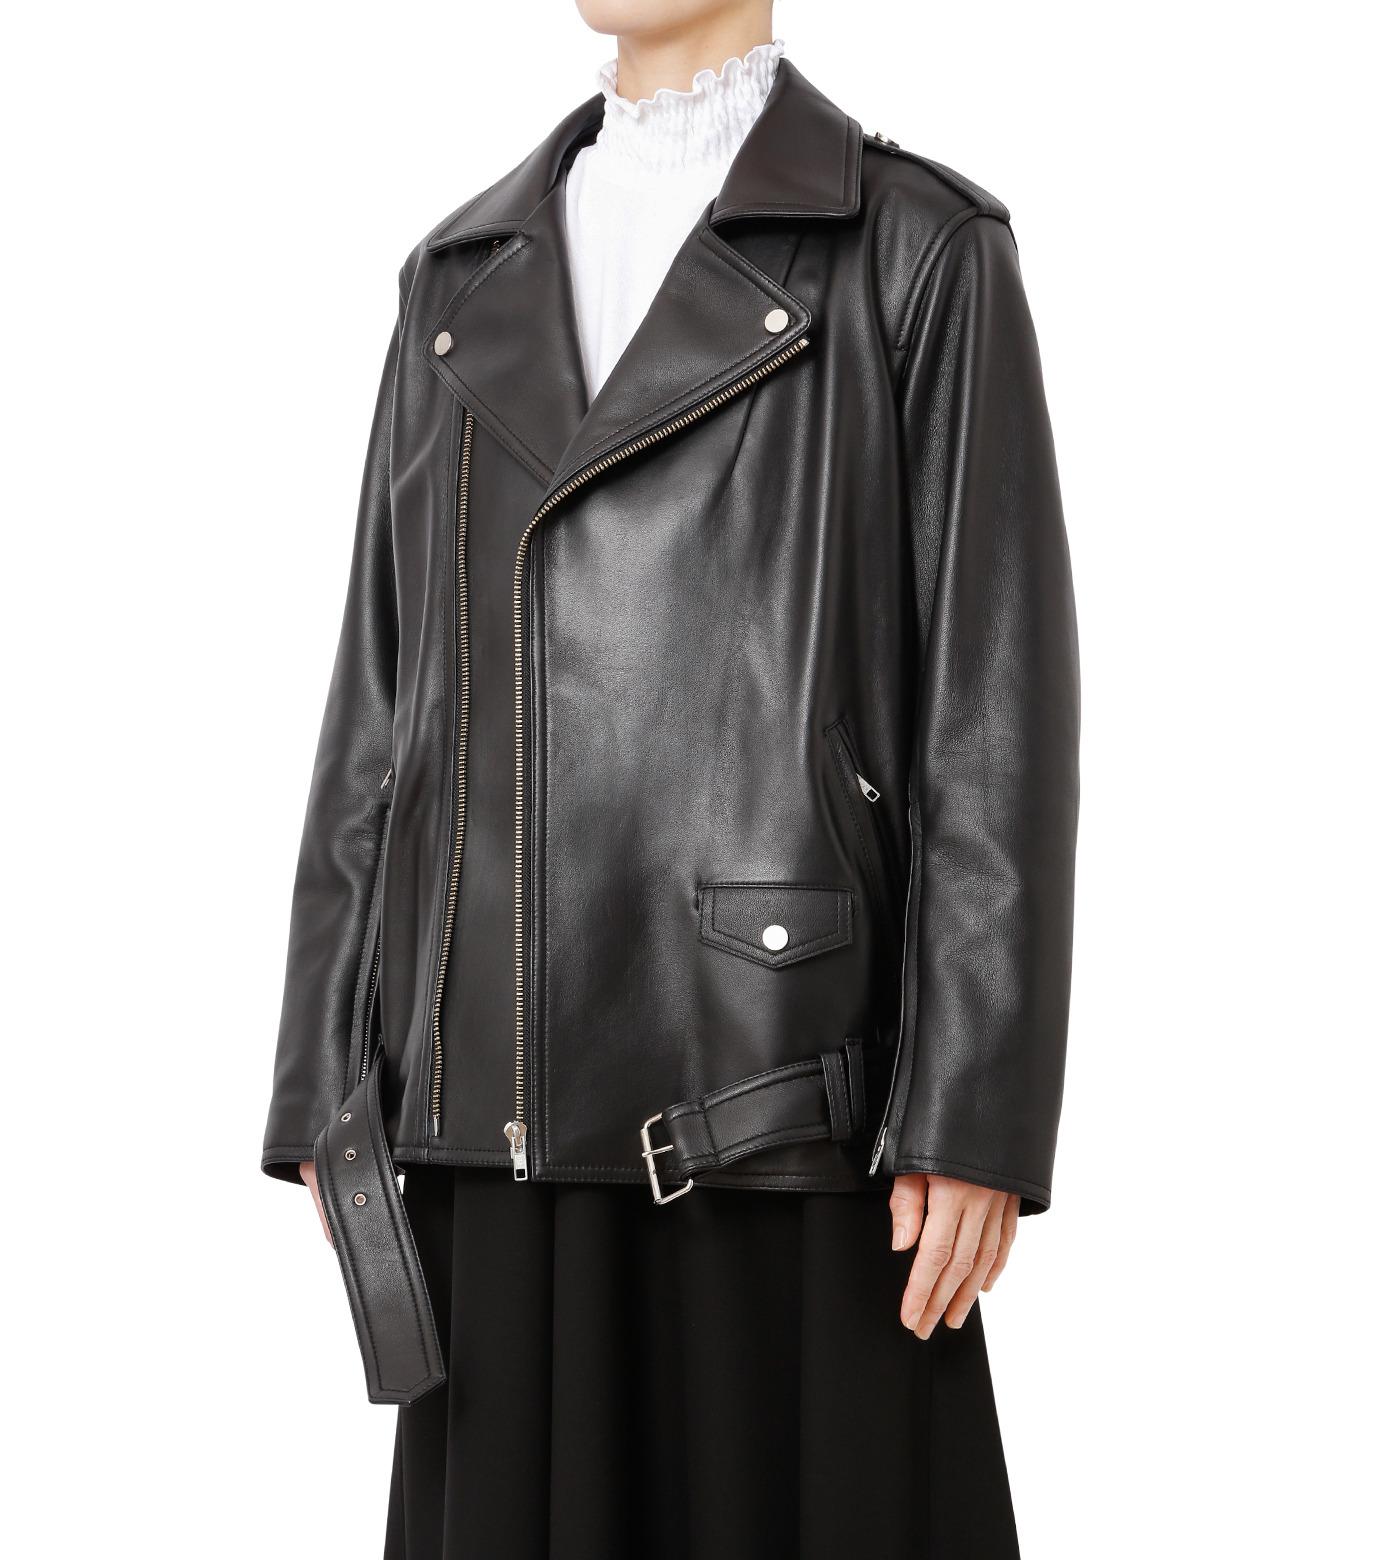 LE CIEL BLEU(ルシェルブルー)のレザーライダースジャケット-BLACK(ジャケット/jacket)-18A64004 拡大詳細画像1